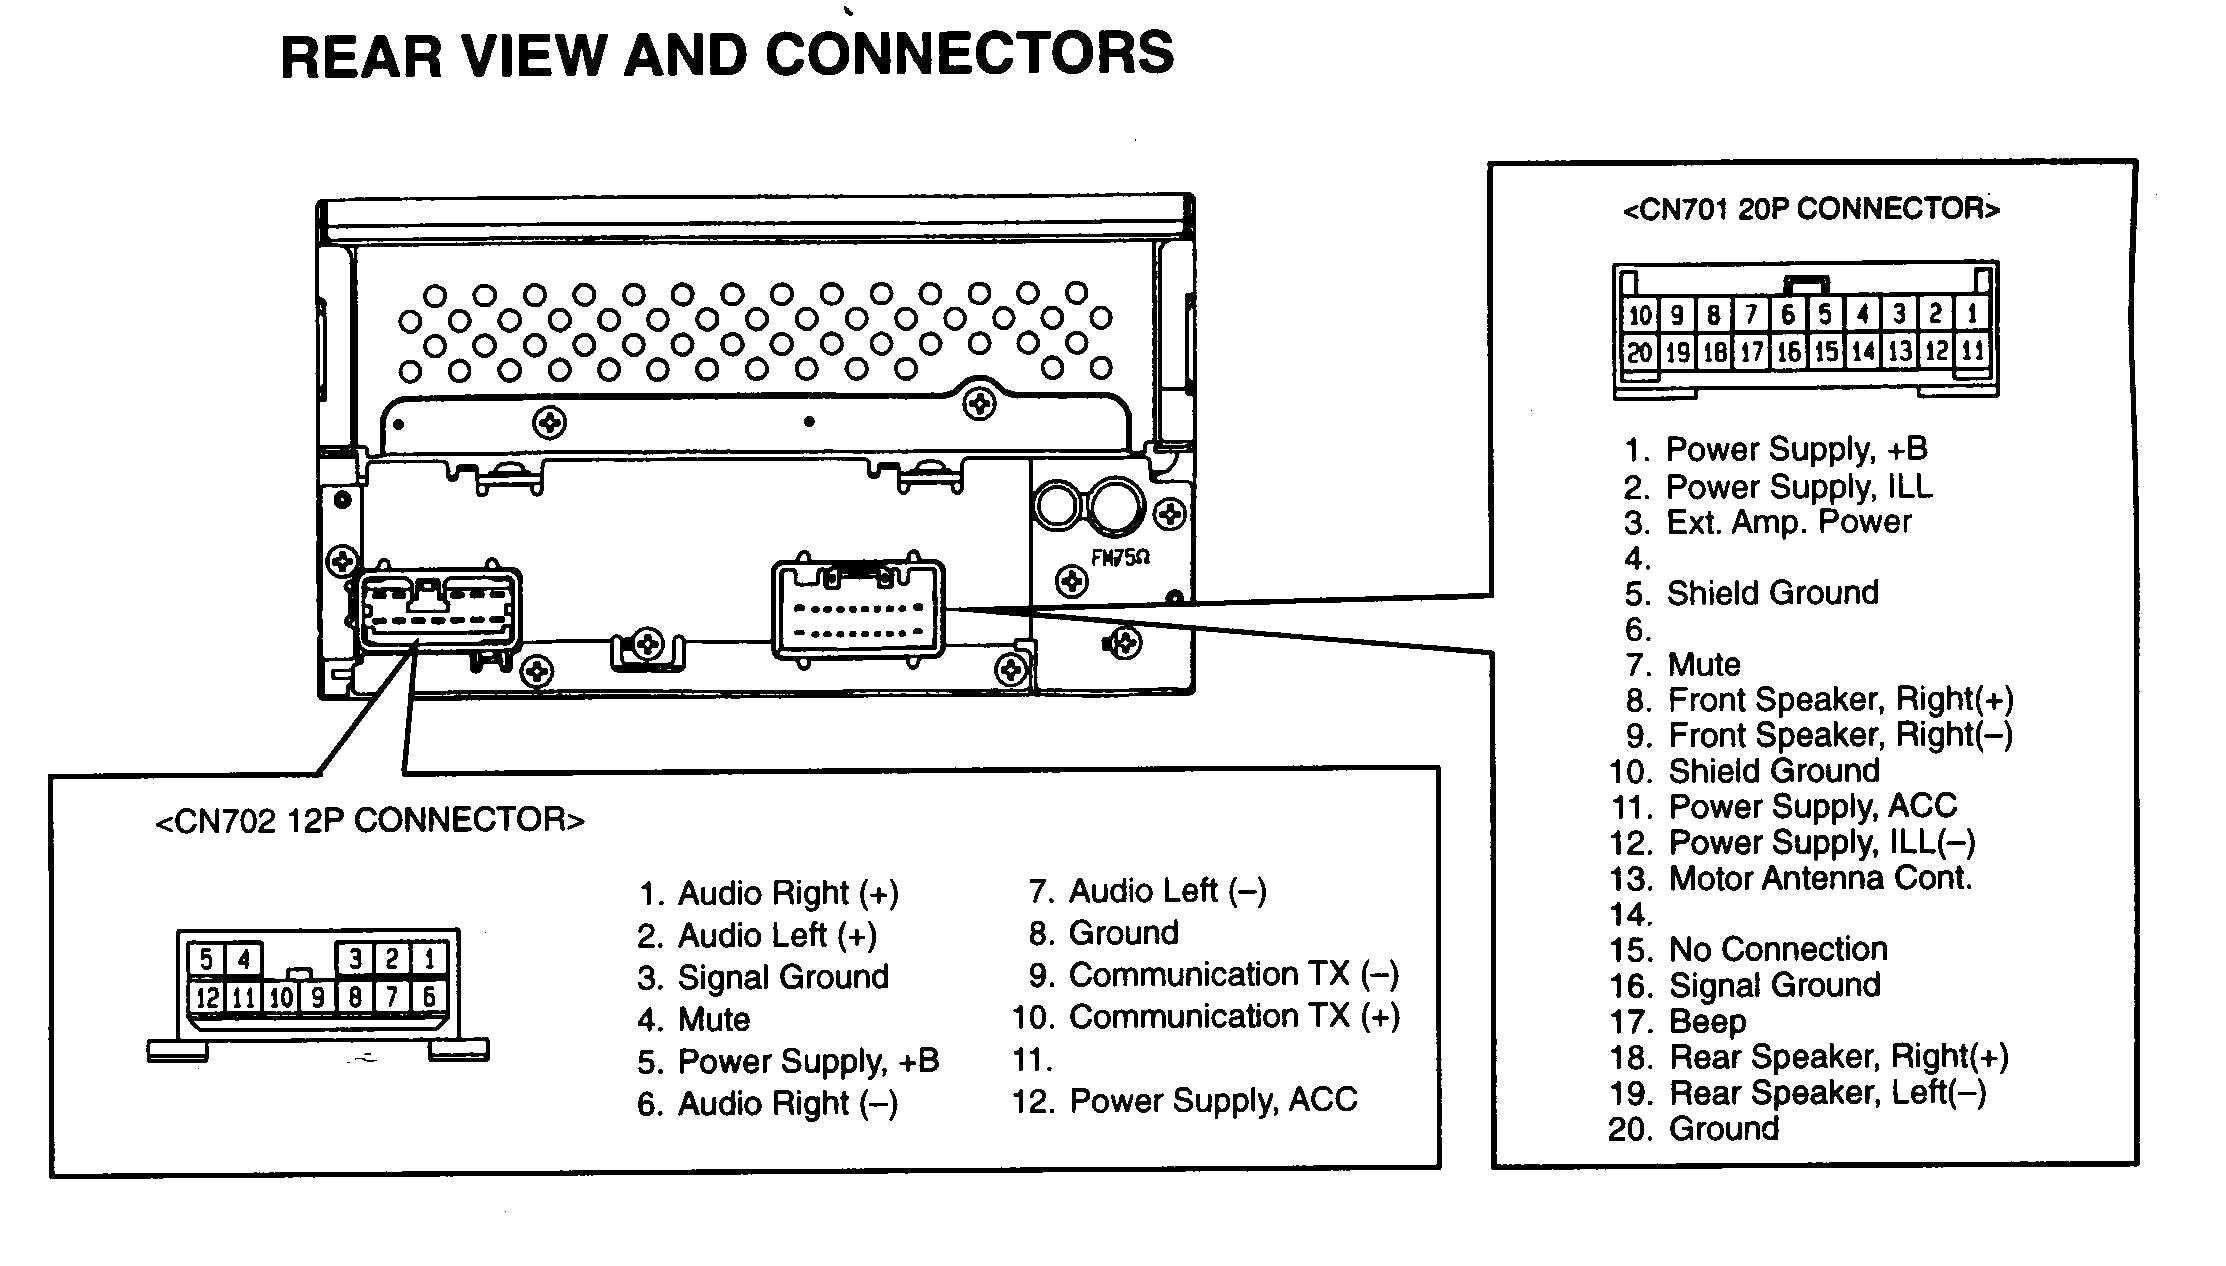 Elegant 2006 Toyota Tacoma Wiring Diagram In 2020 Electrical Wiring Diagram Car Stereo Diagram